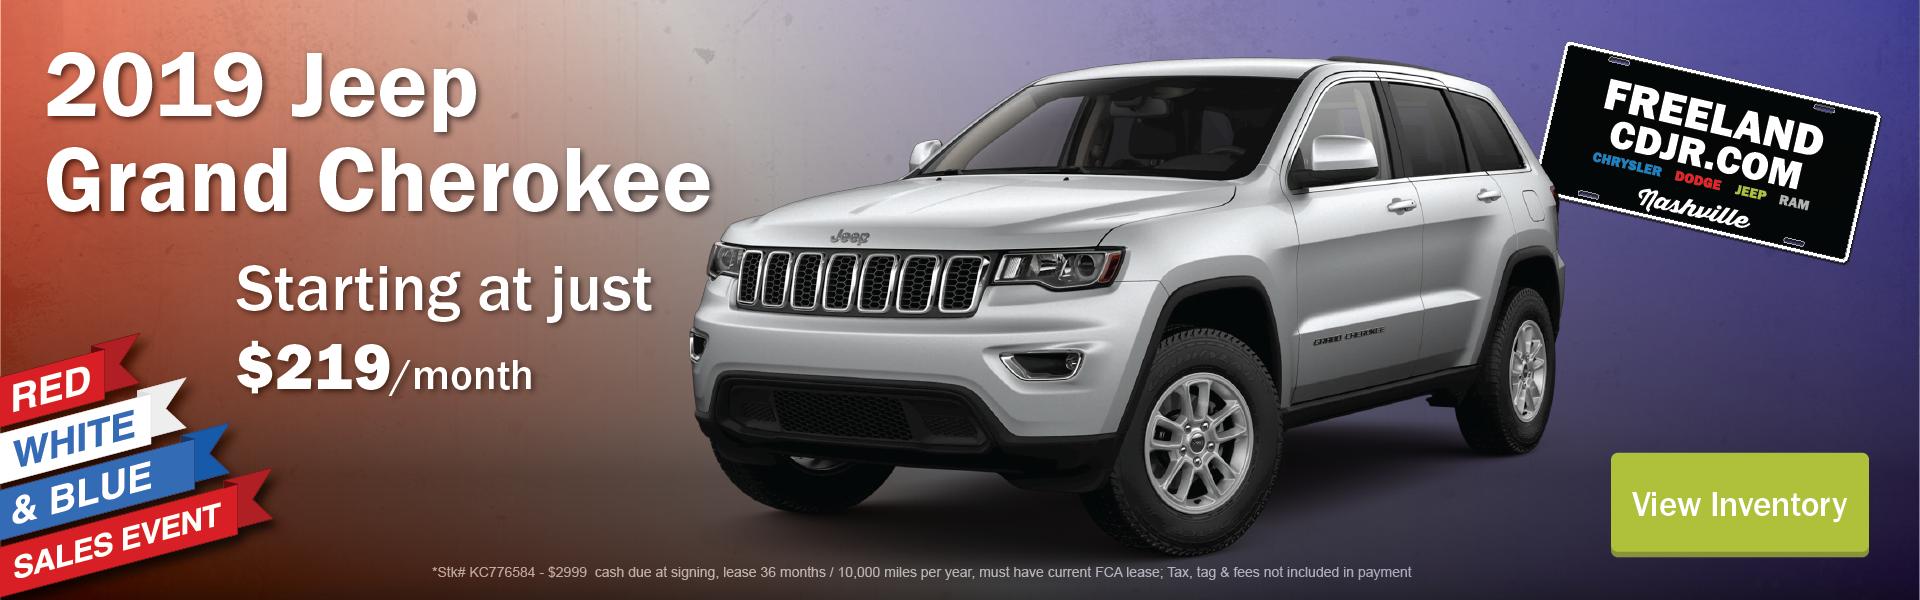 Jeeps For Sale In Tn >> Freeland Chrysler Dodge Jeep Ram Chrysler Dodge Jeep Ram Dealer